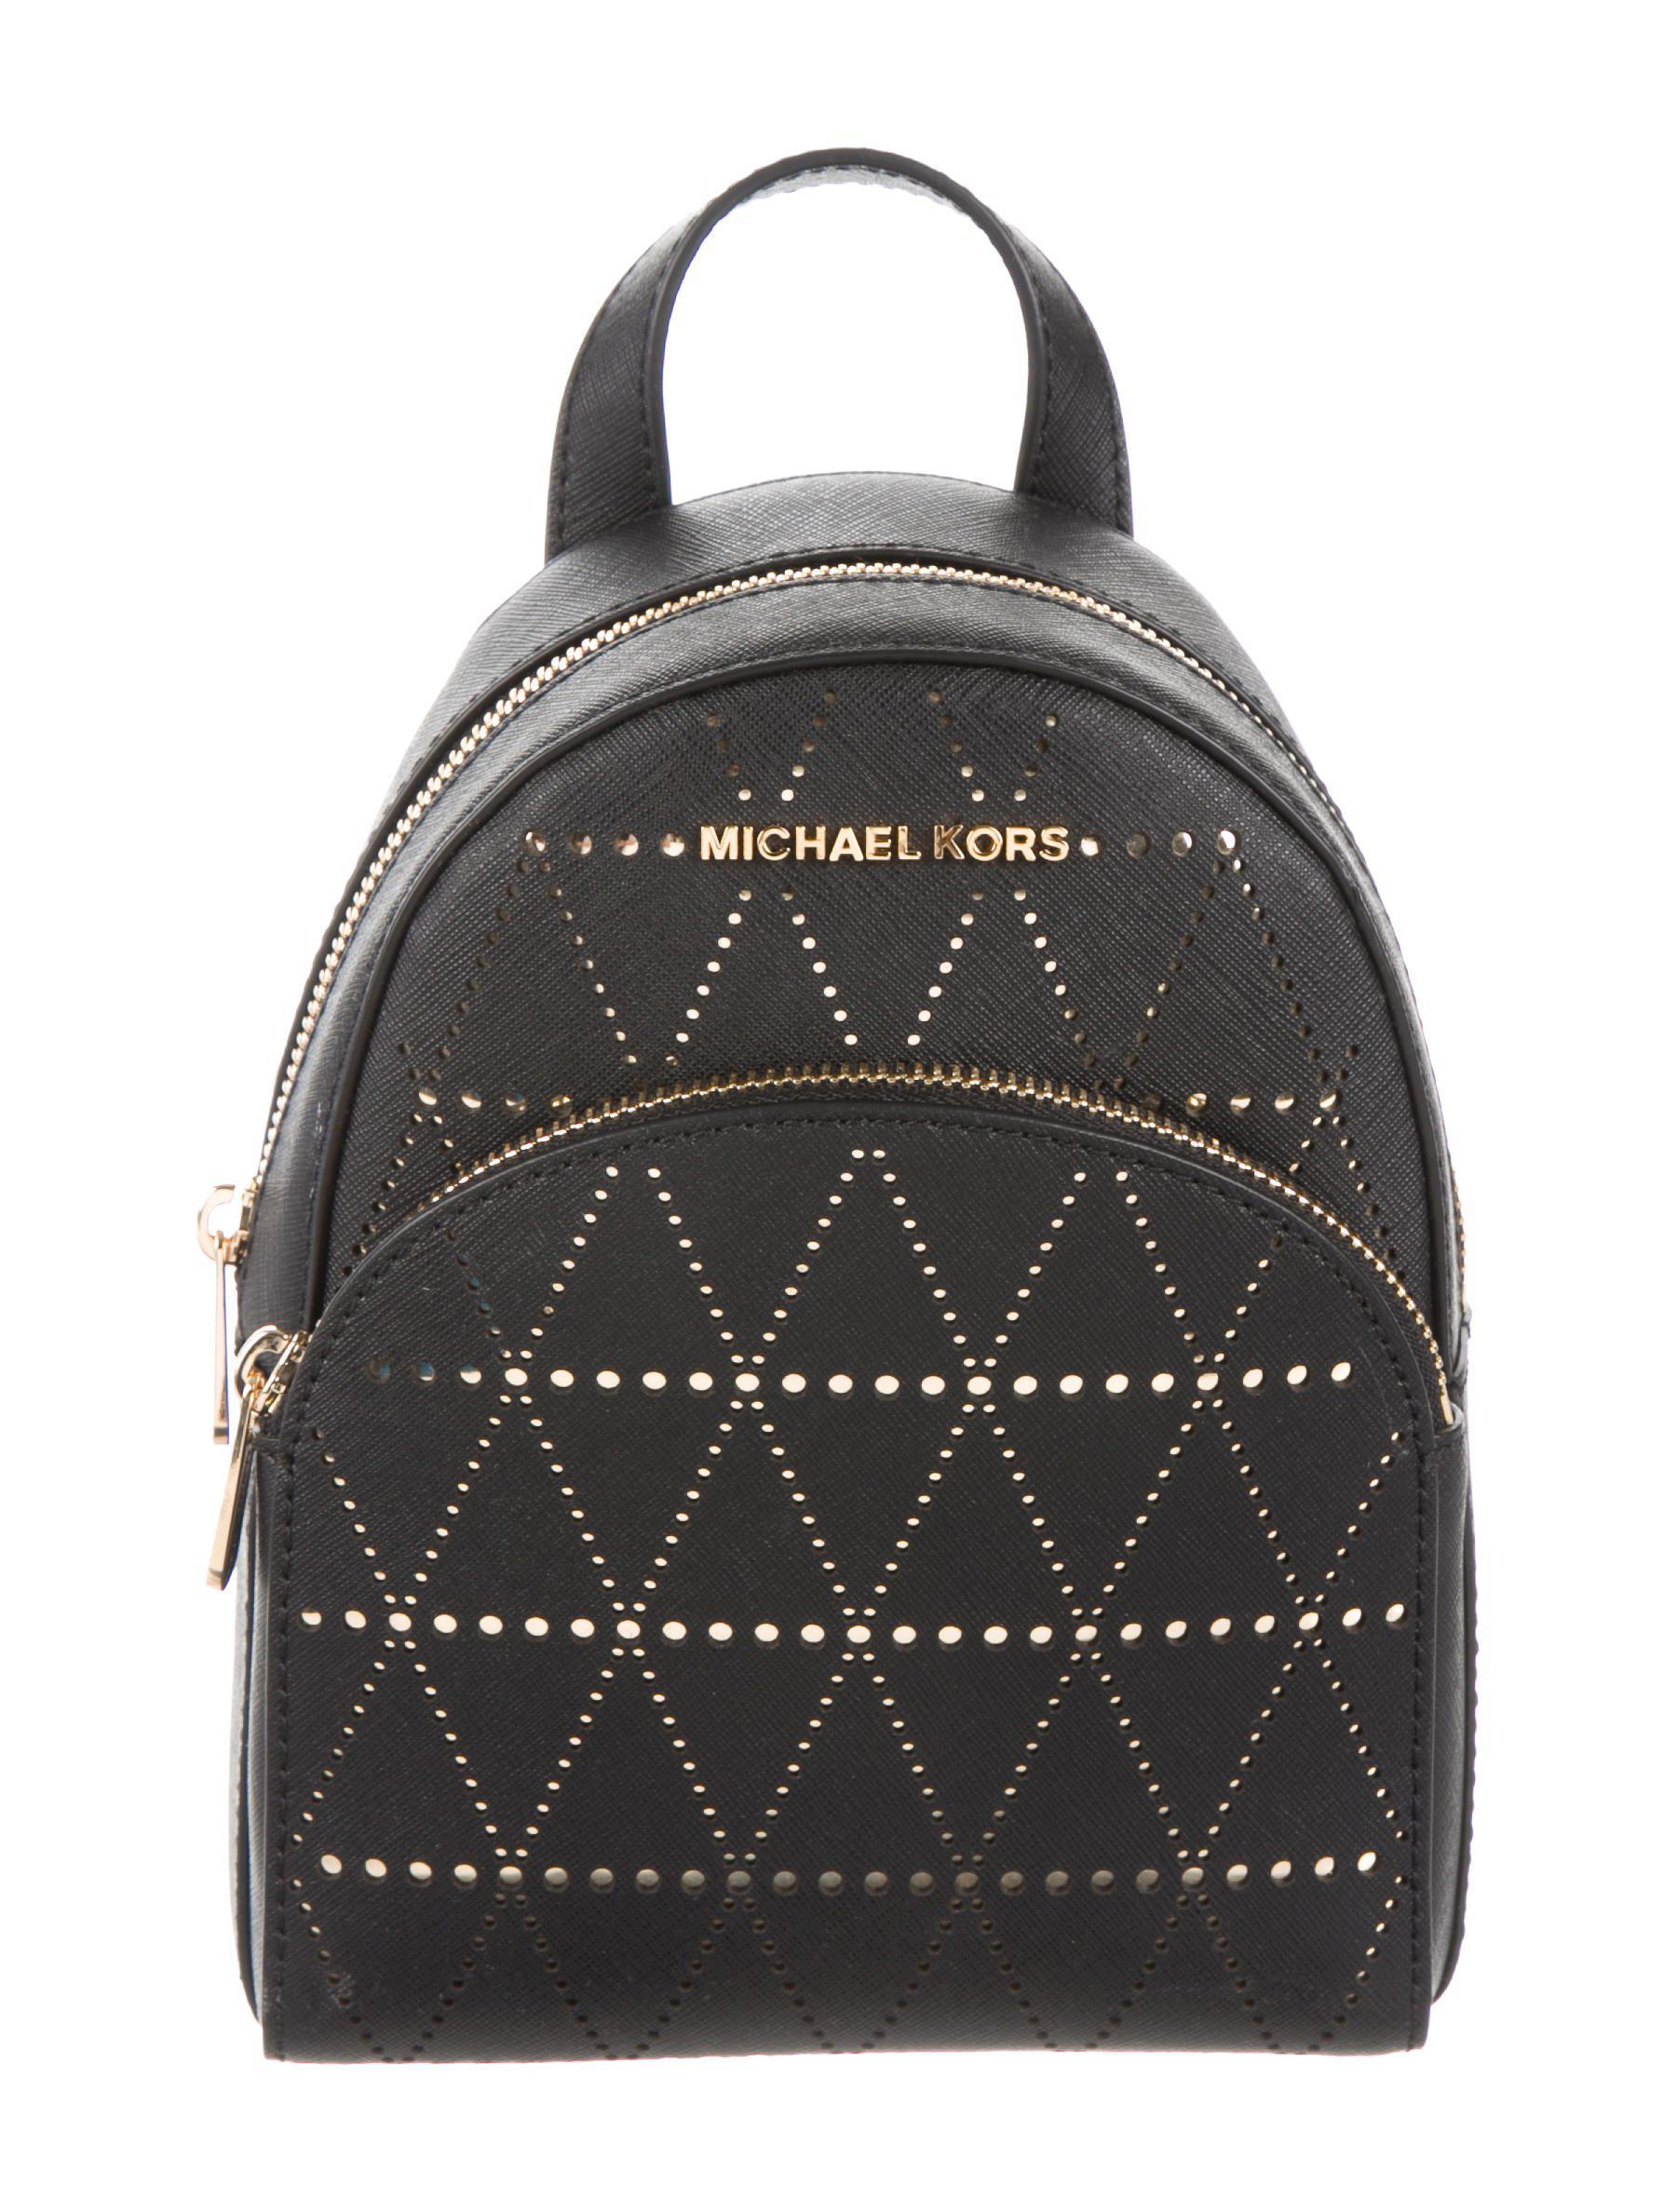 27d83a096ce3 MICHAEL Michael Kors. Women s Metallic Michael Kors Leather Abbey Backpack  Black